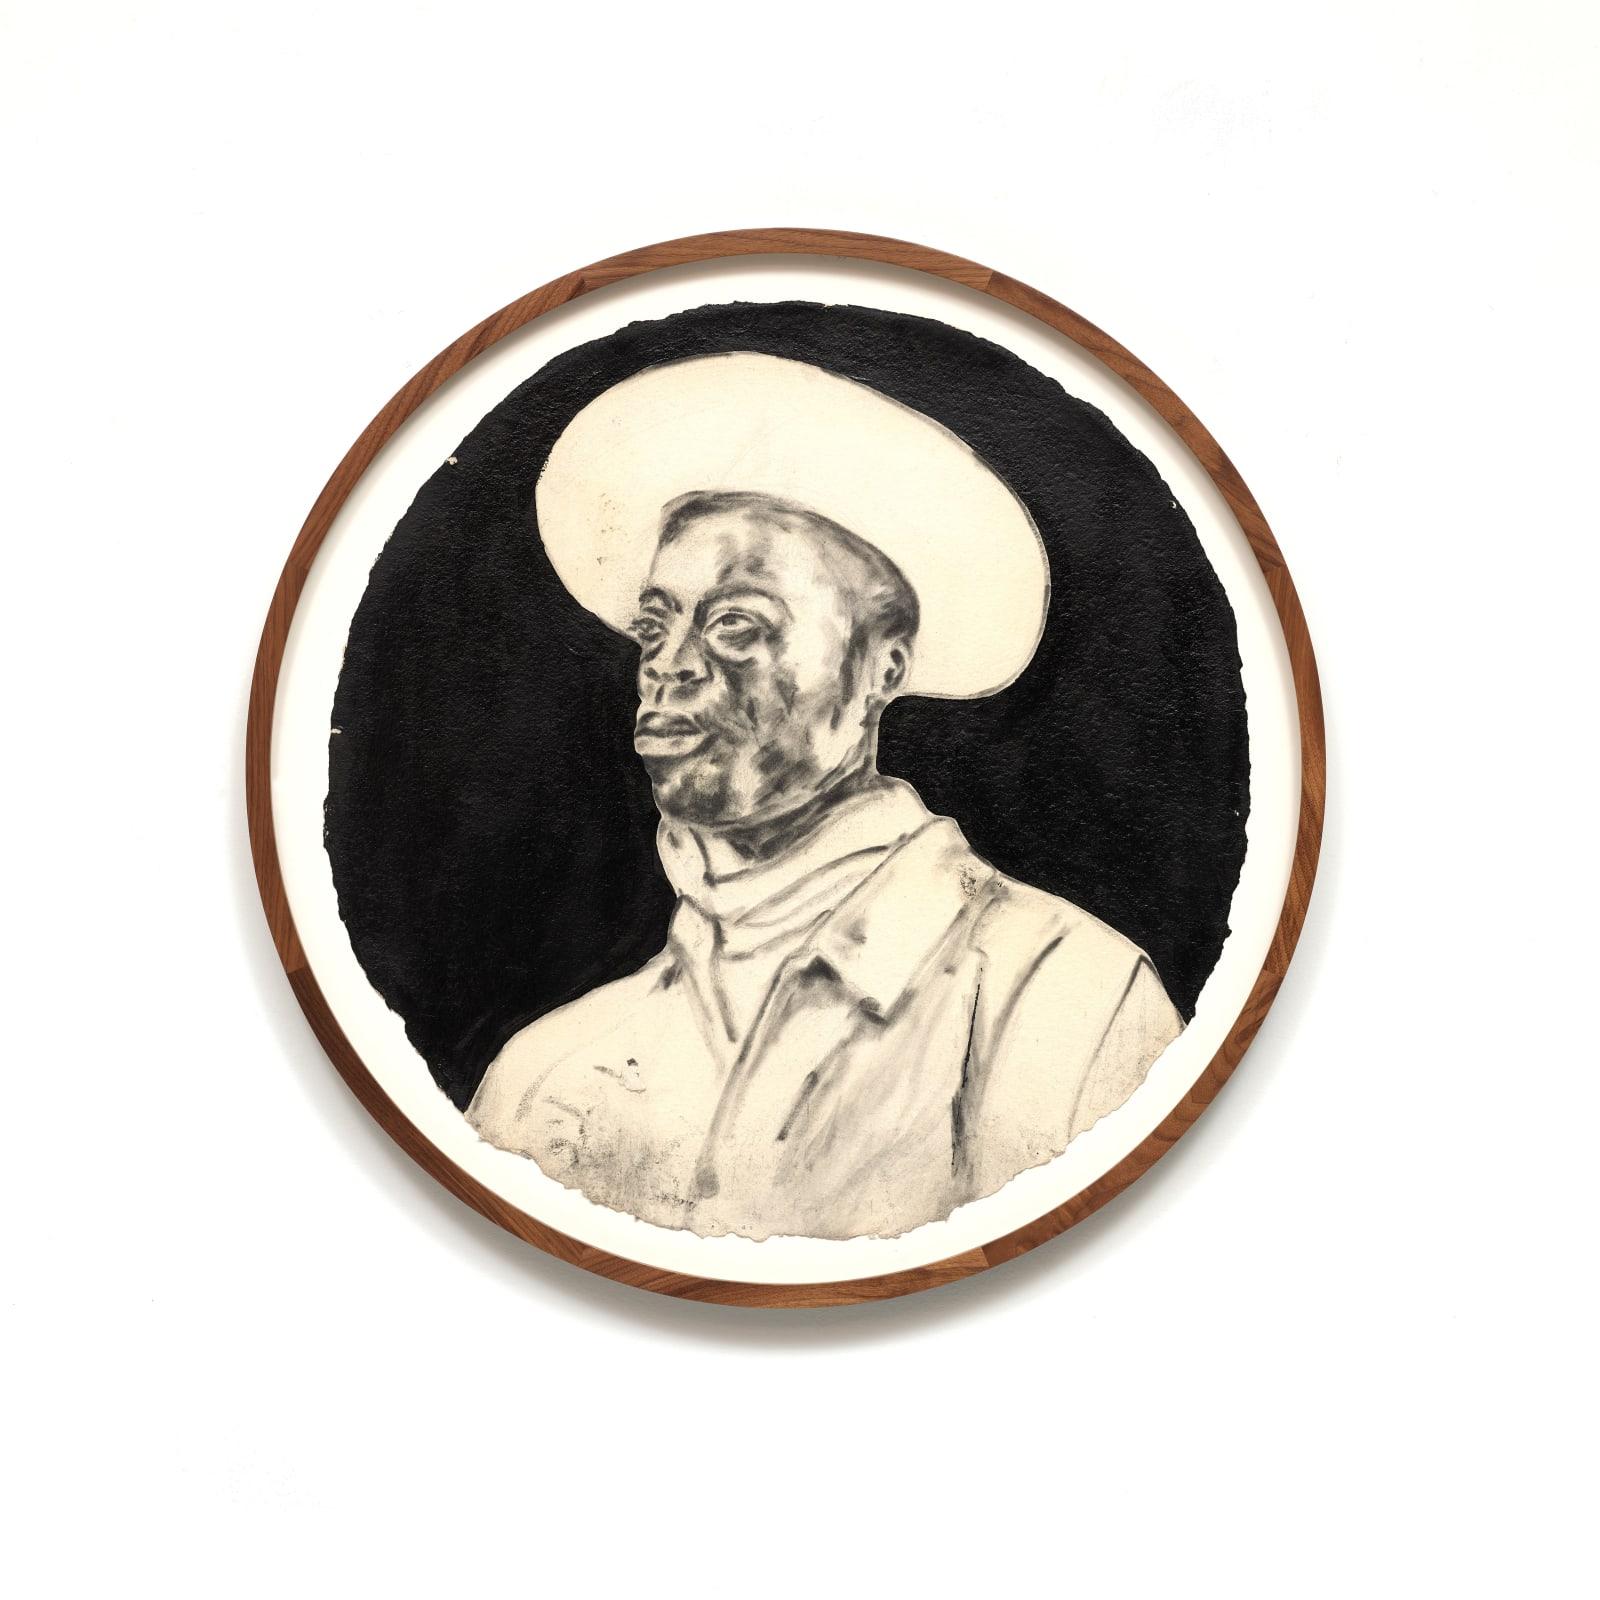 Serge Attukwei Clottey, Throughout time, 2020